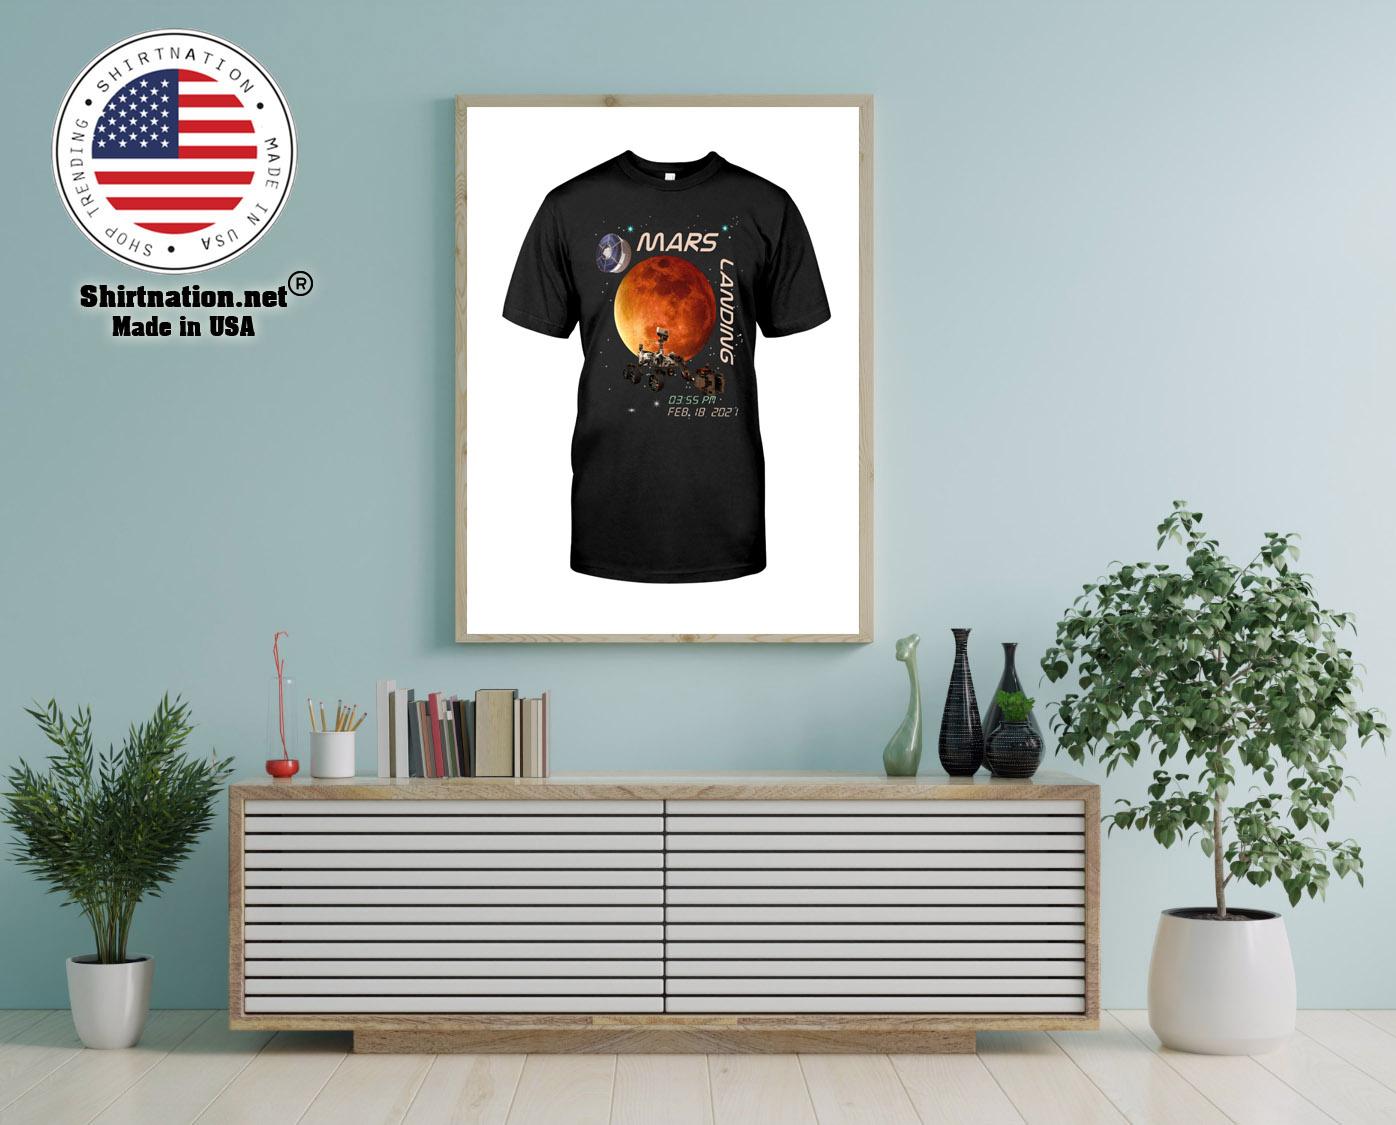 Mars landing february 18 2021 shirt 12